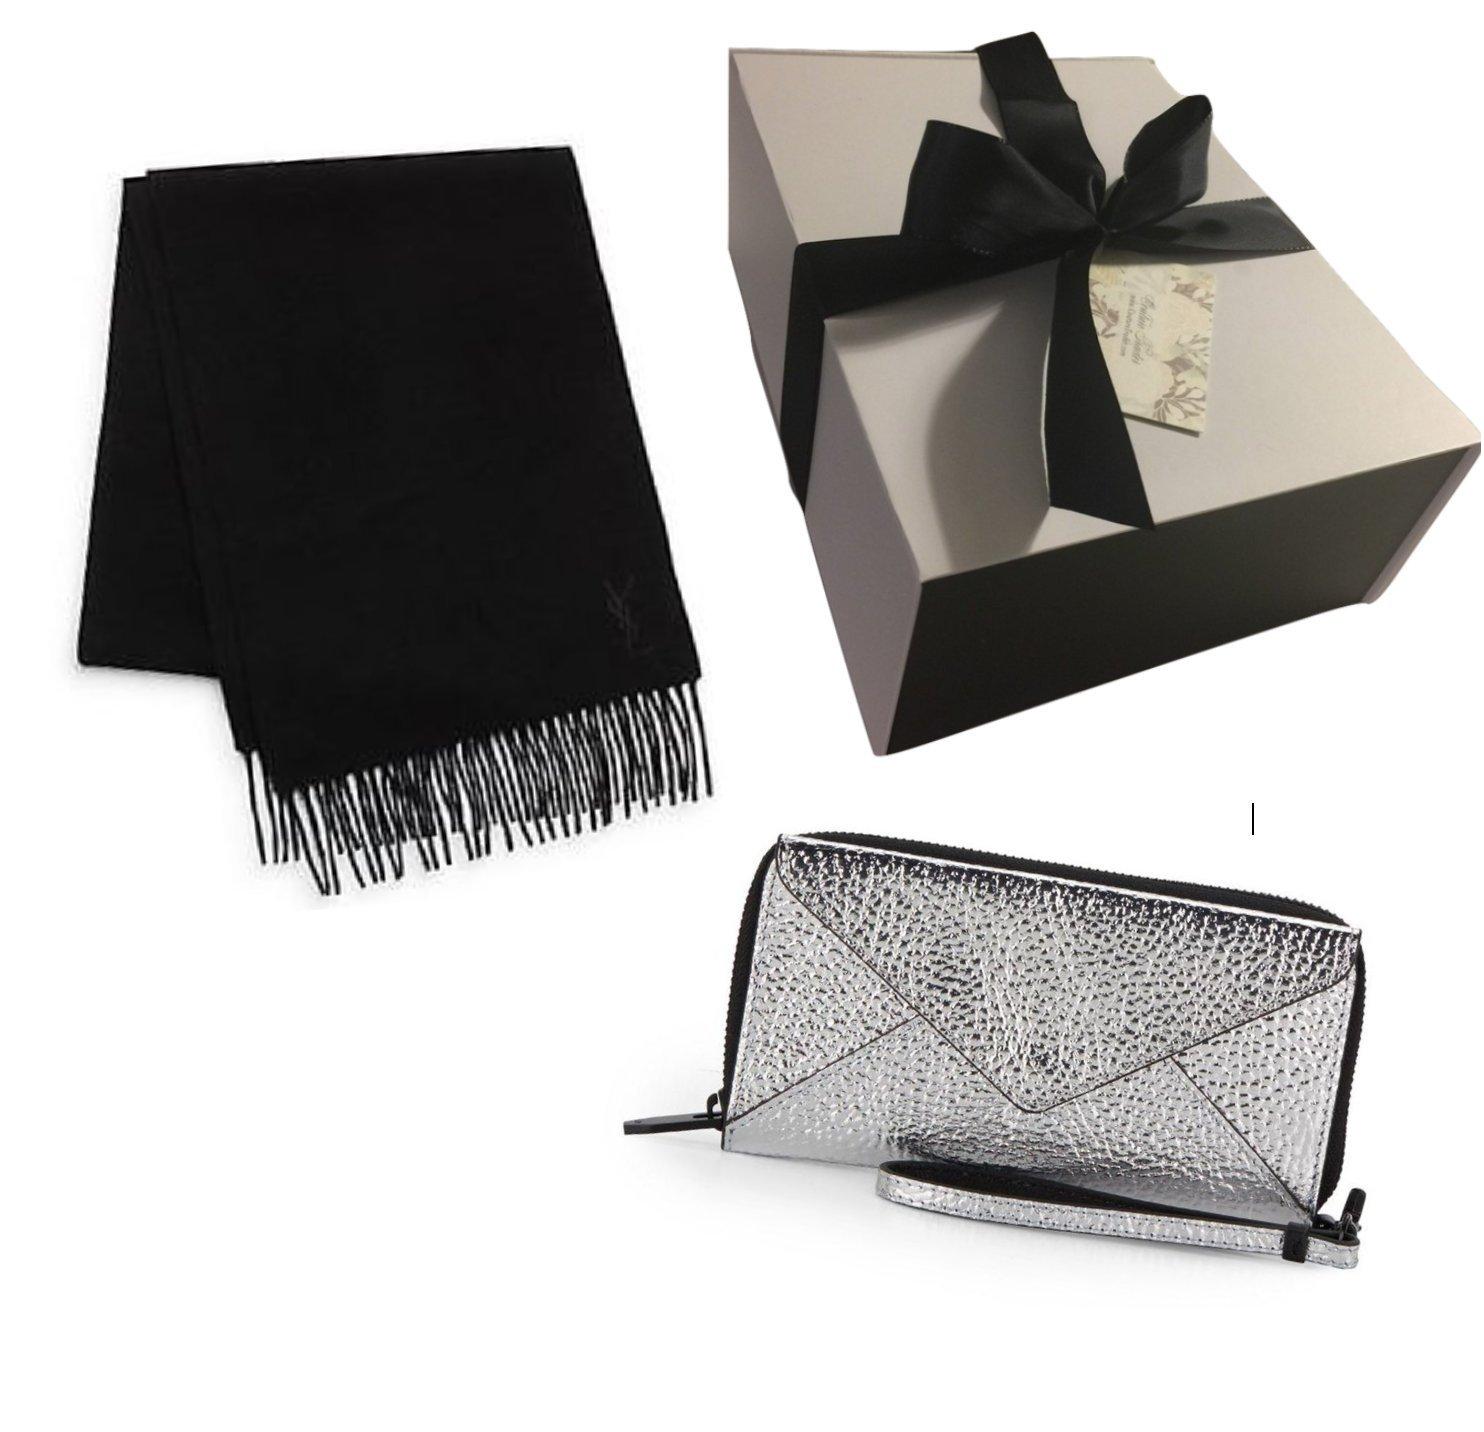 Loeffler Randall & YSL Lux Gift Bundle Valued $525